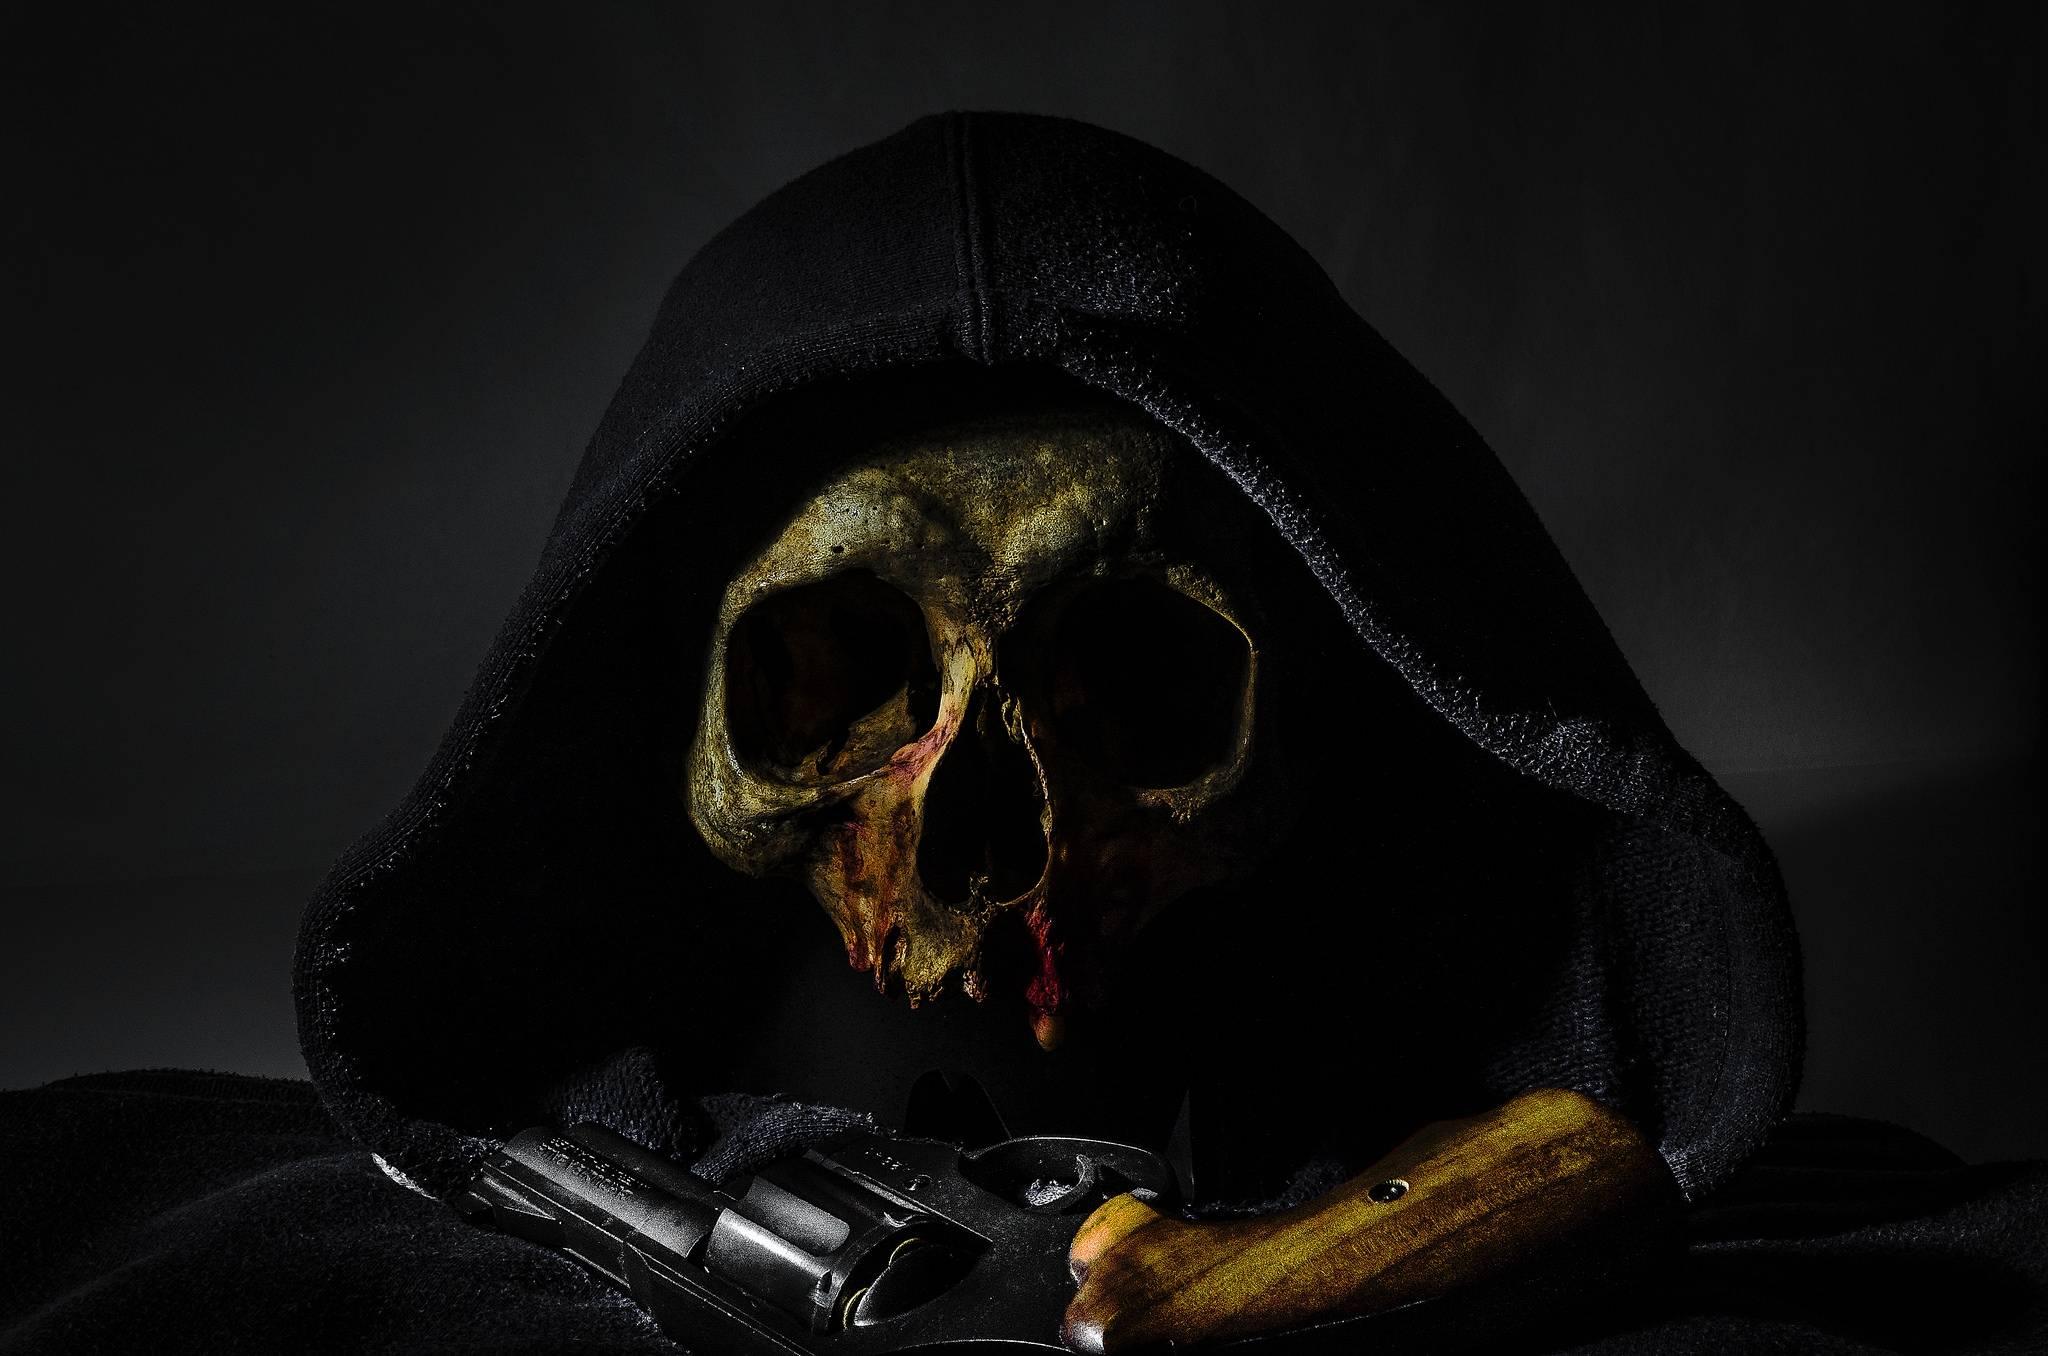 обои Револьвер, пистолет, череп, натюрморт картинки фото